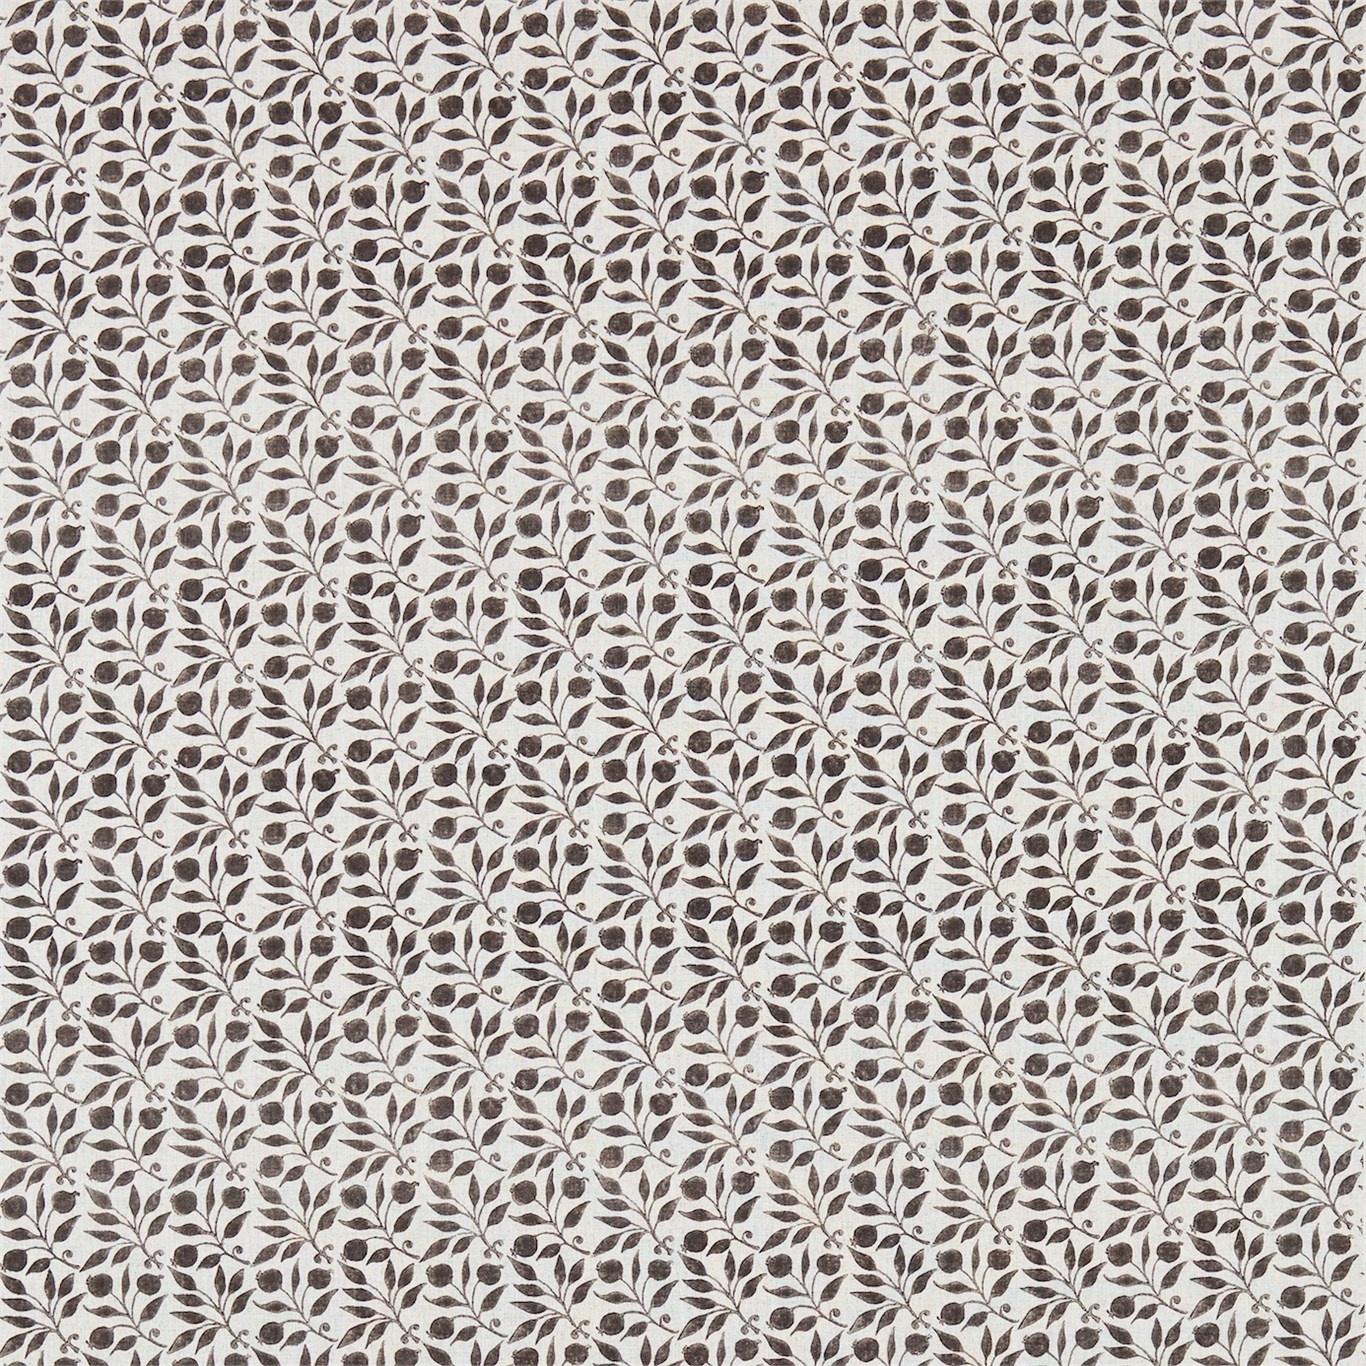 Image of Morris & Co Rosehip Black/Ecru Curtain Fabric 224488